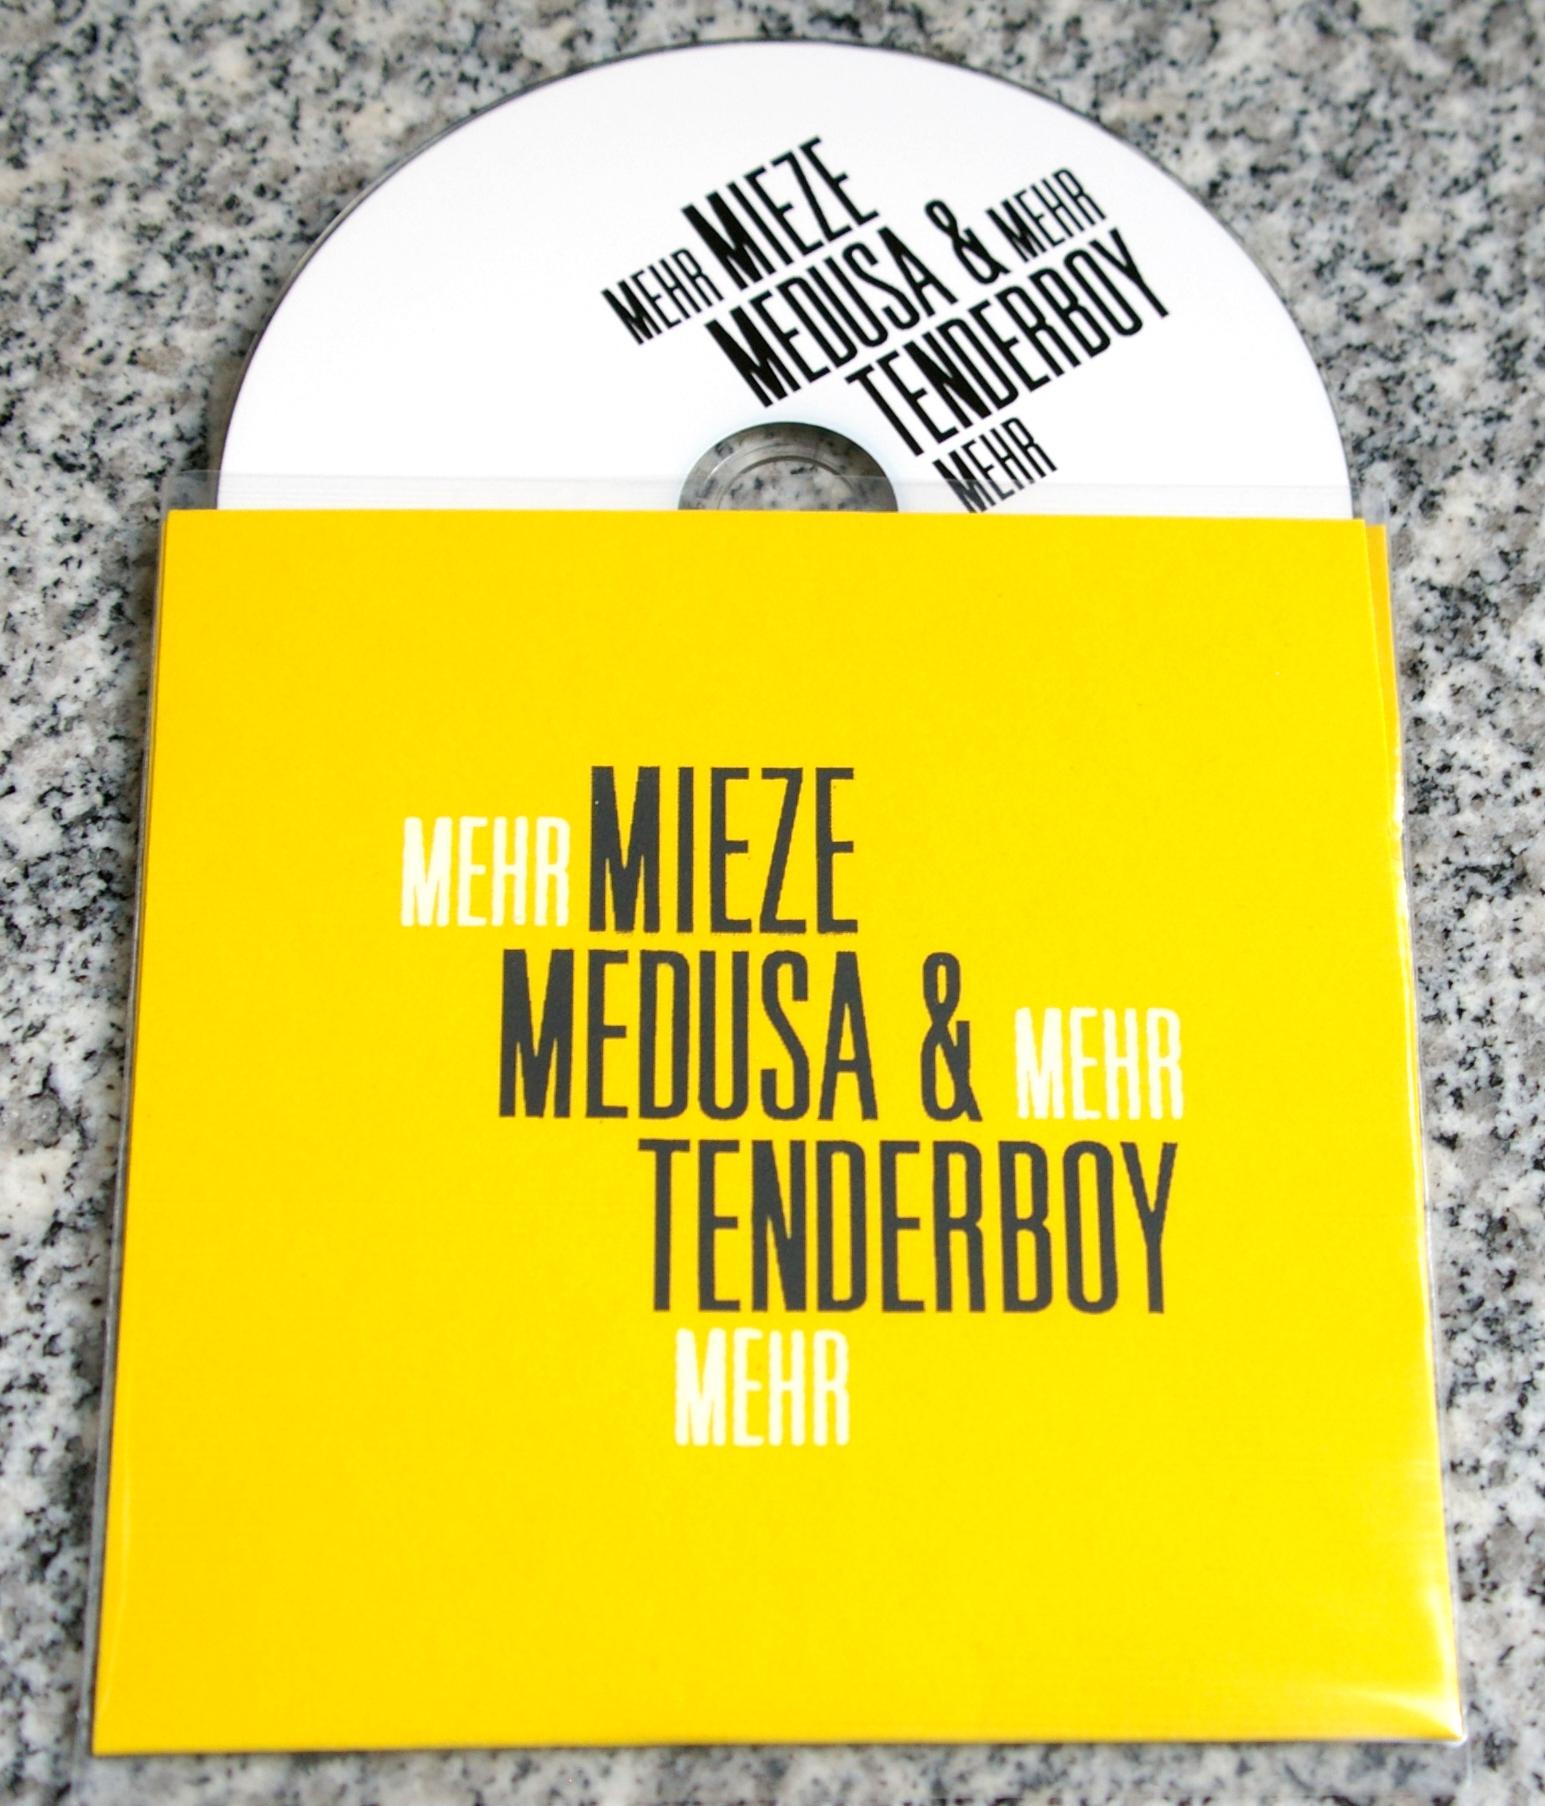 mehrmehrmehr cd-single